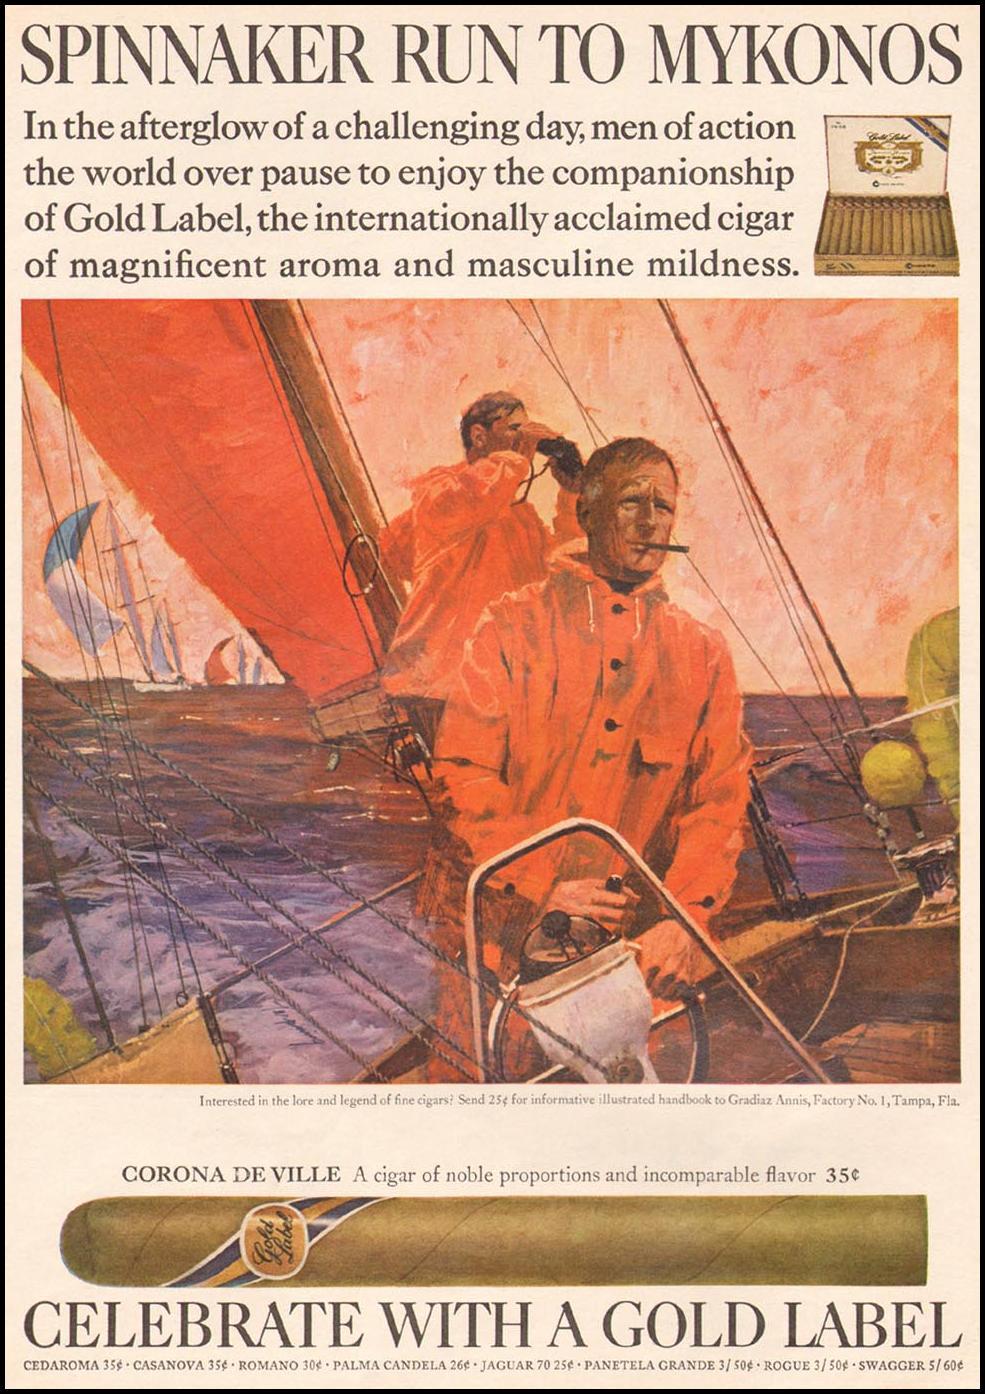 CORONA DE VILLE CIGARS NEWSWEEK 06/17/1968